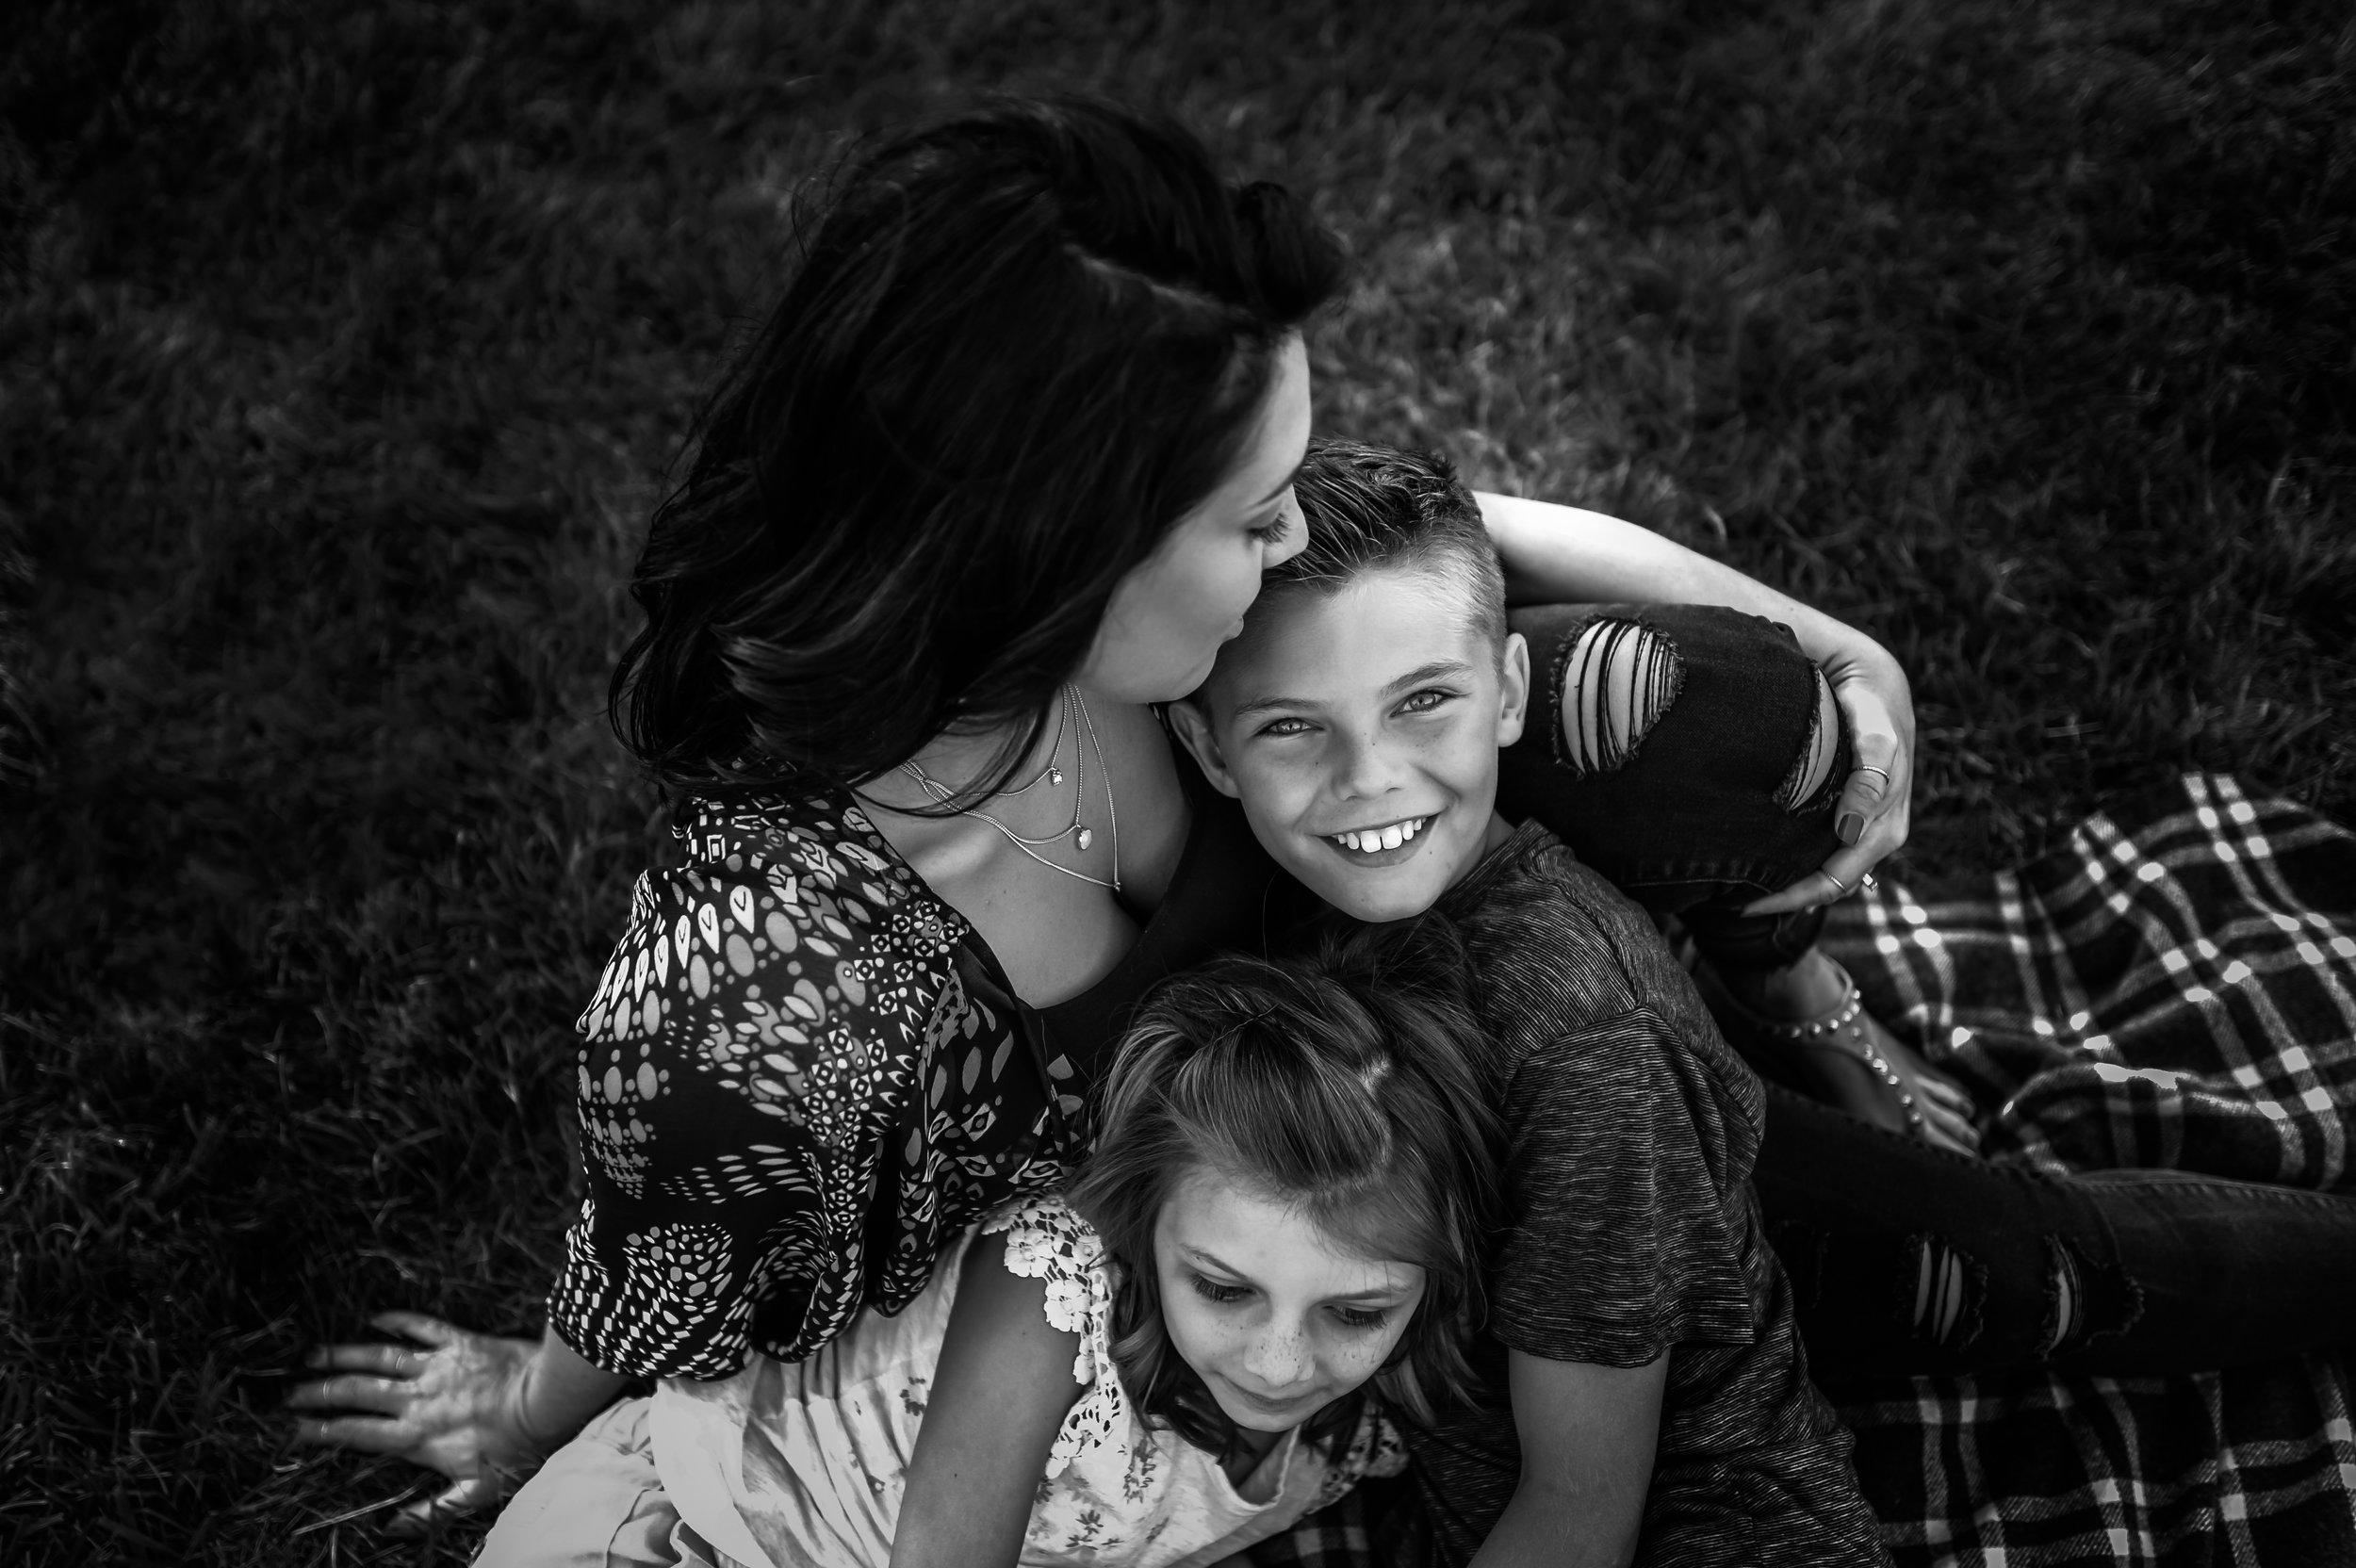 Kelly Jacobi Photography | Wausau Photographer Wausau Family Photographer Wausau Lifestyle Photographer Travel Photographer Central Wisconsin Photographer